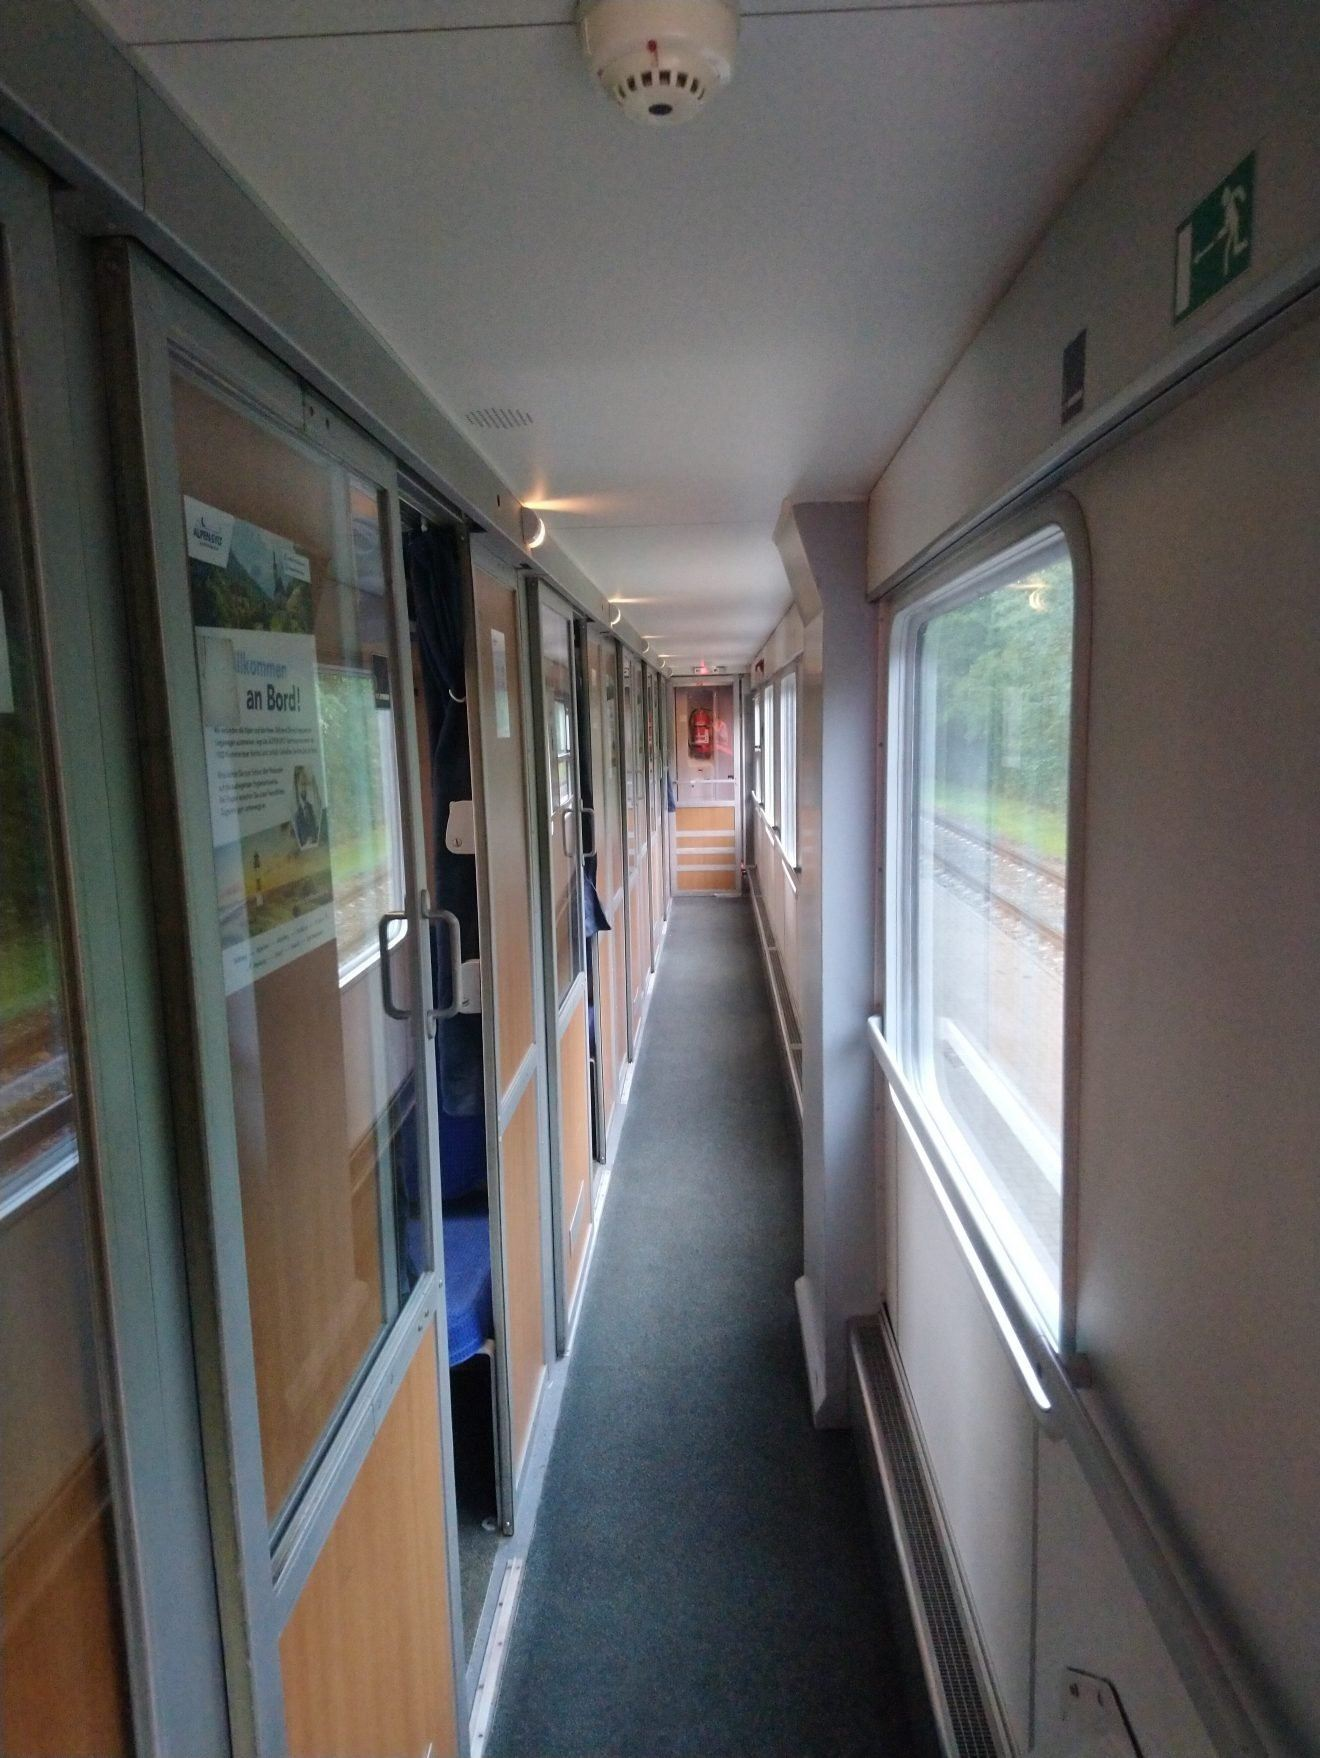 Couchette Corridor